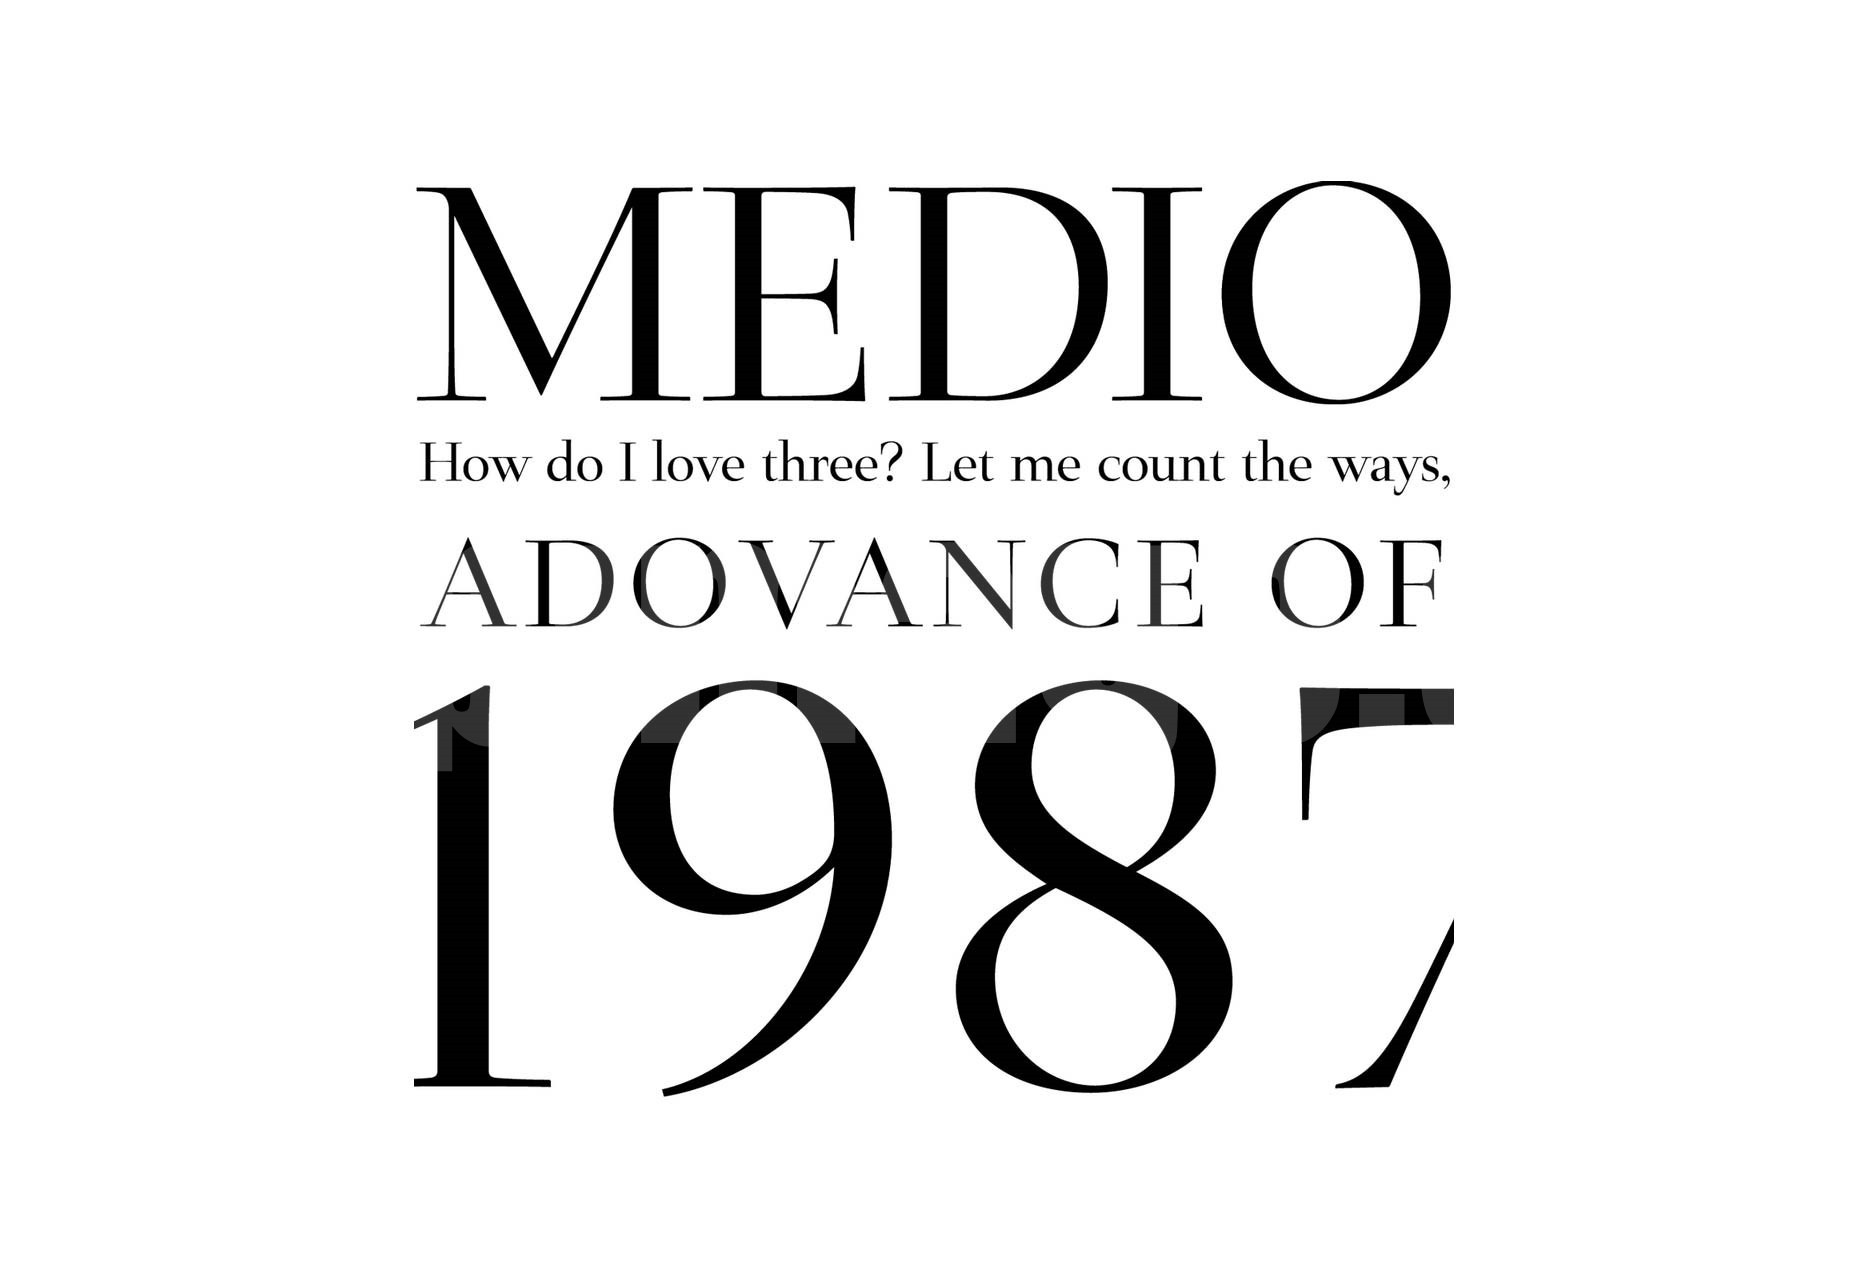 MEDIO衬线经典英文字体下载